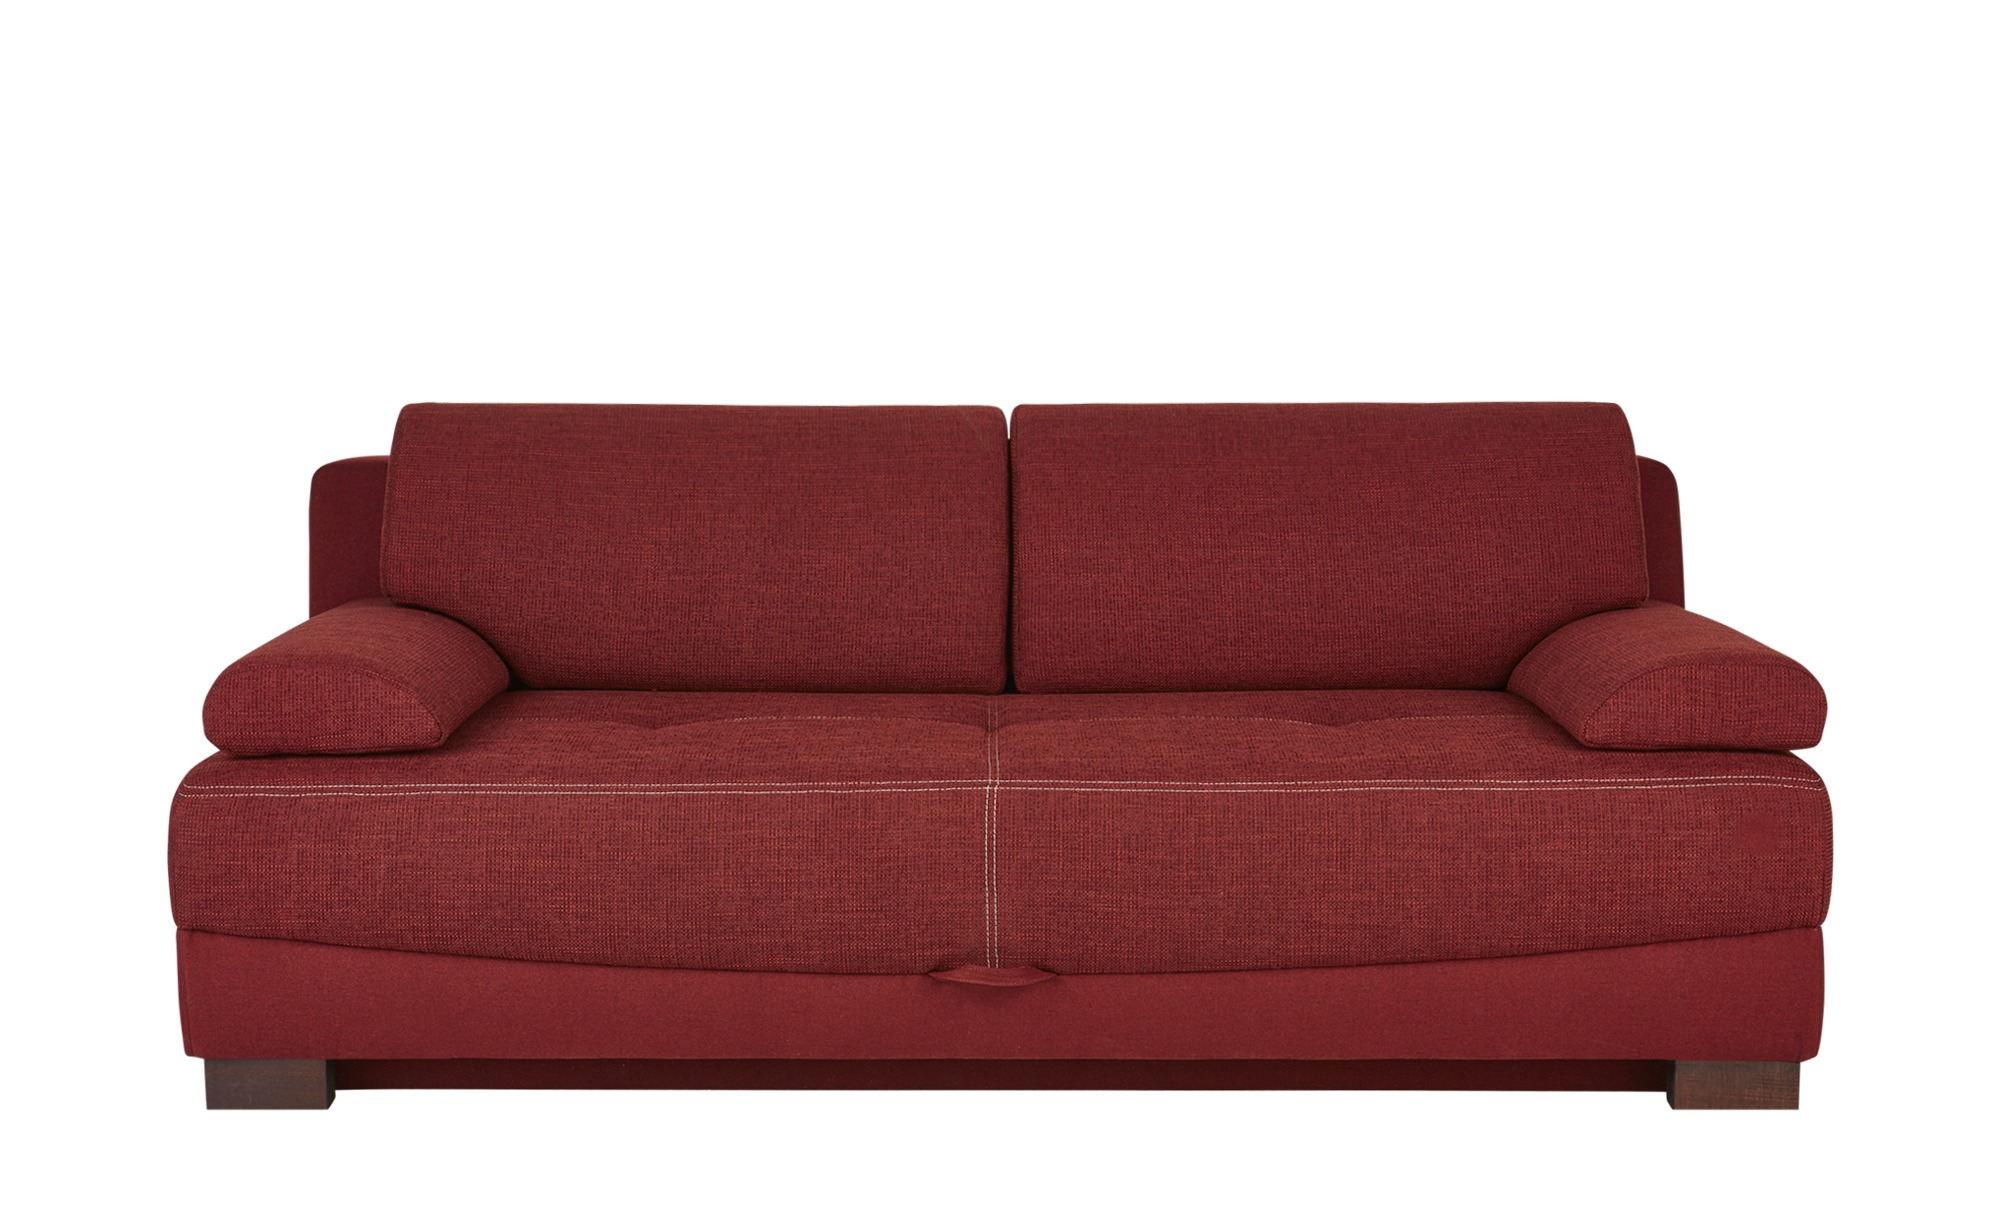 Schlafsofa rot-braun - Webstoff Gianna ¦ rot ¦ Maße (cm): B: 199 H: 85 T: 94 Polstermöbel > Sofas > 2-Sitzer - Höffner